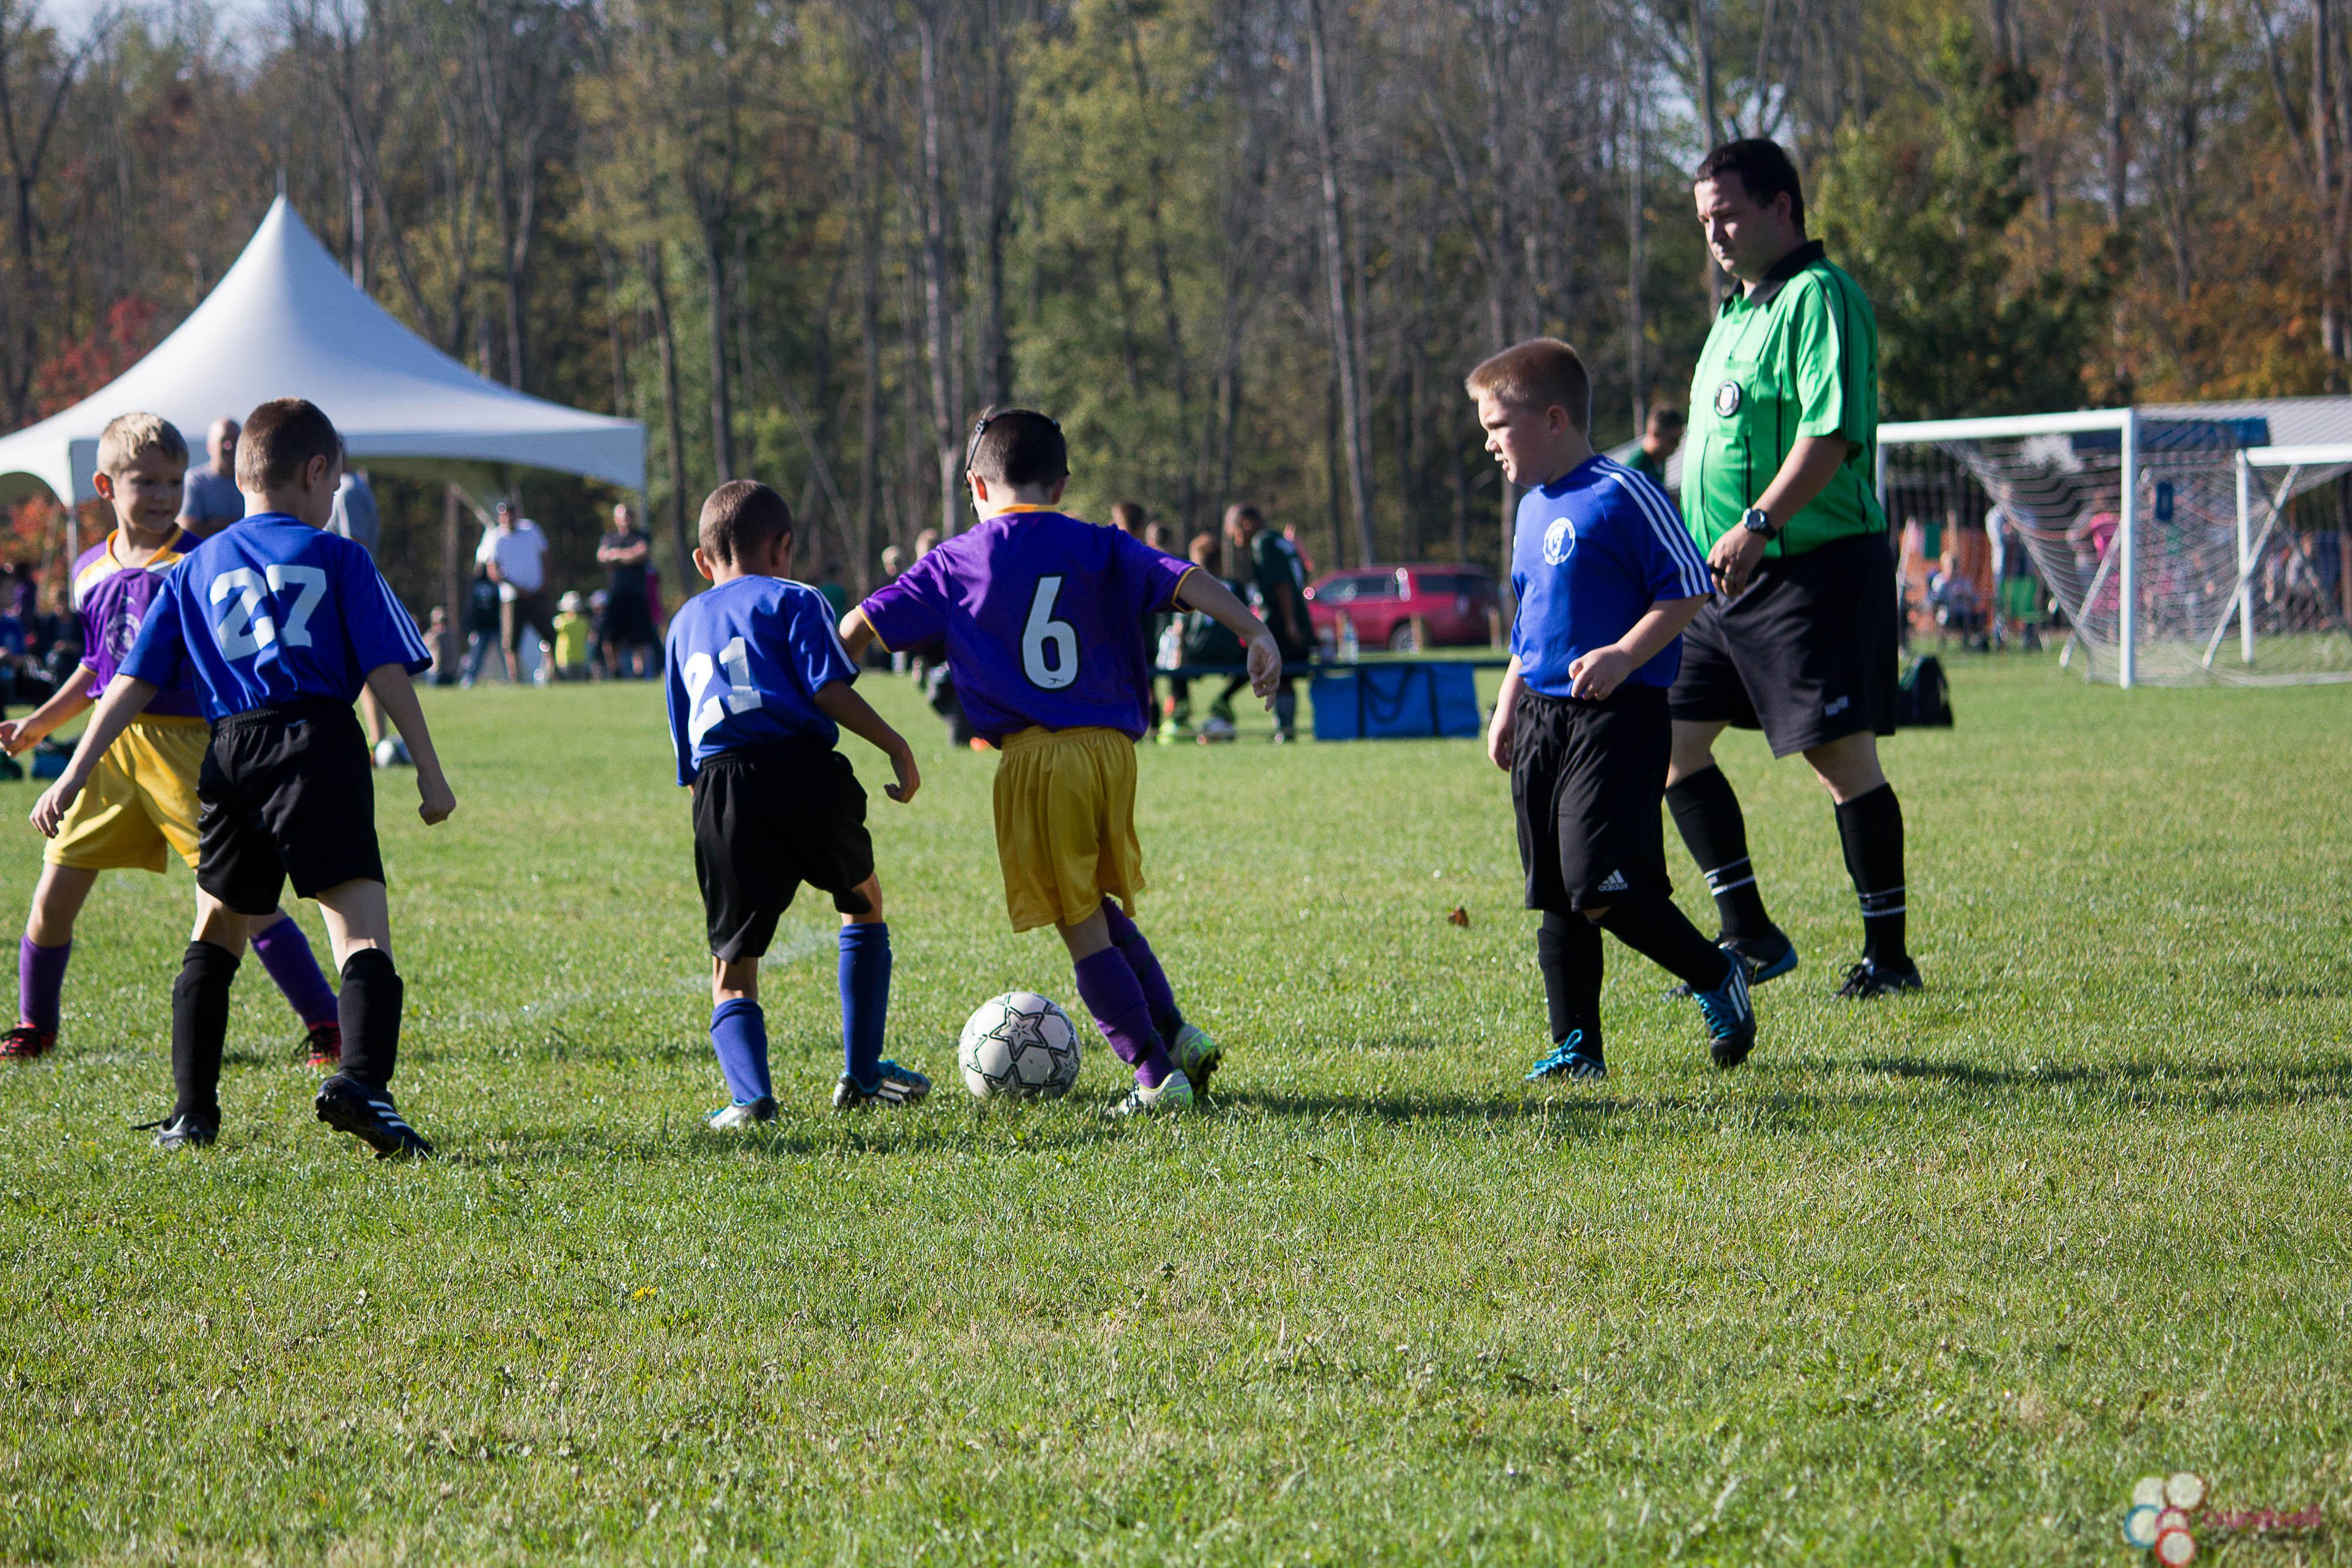 2017-10-14-Spartan-U9-Soccer-Final (22 of 134)